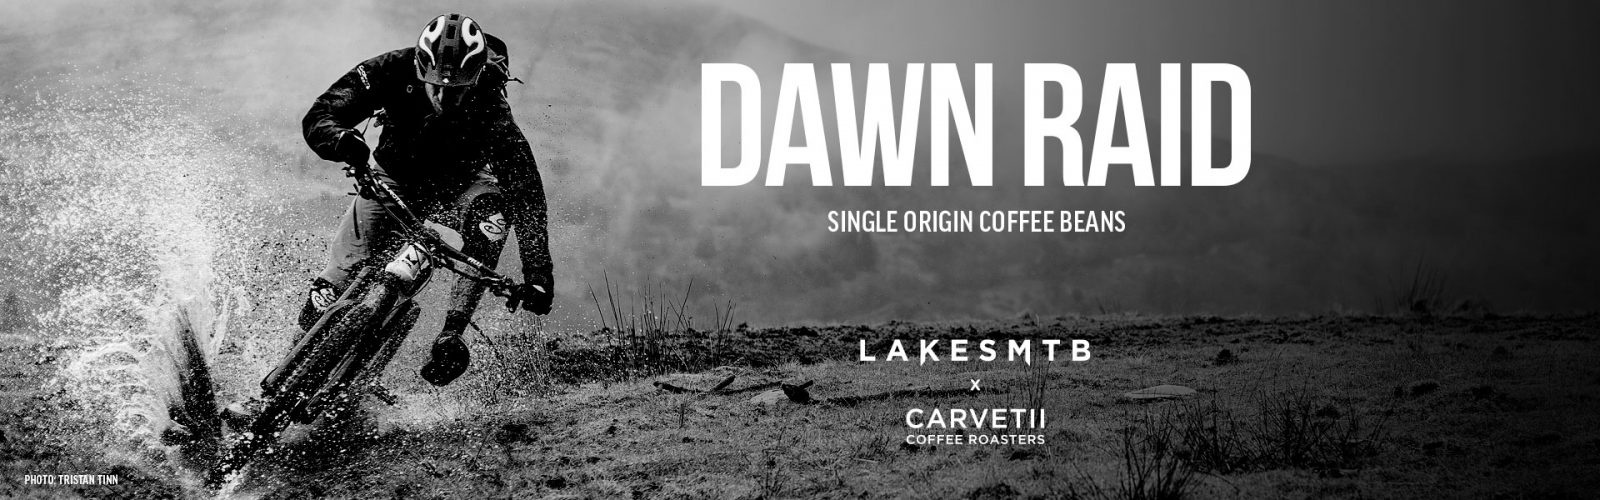 DAWNRAID-lakesmtb-carvetii-coffee